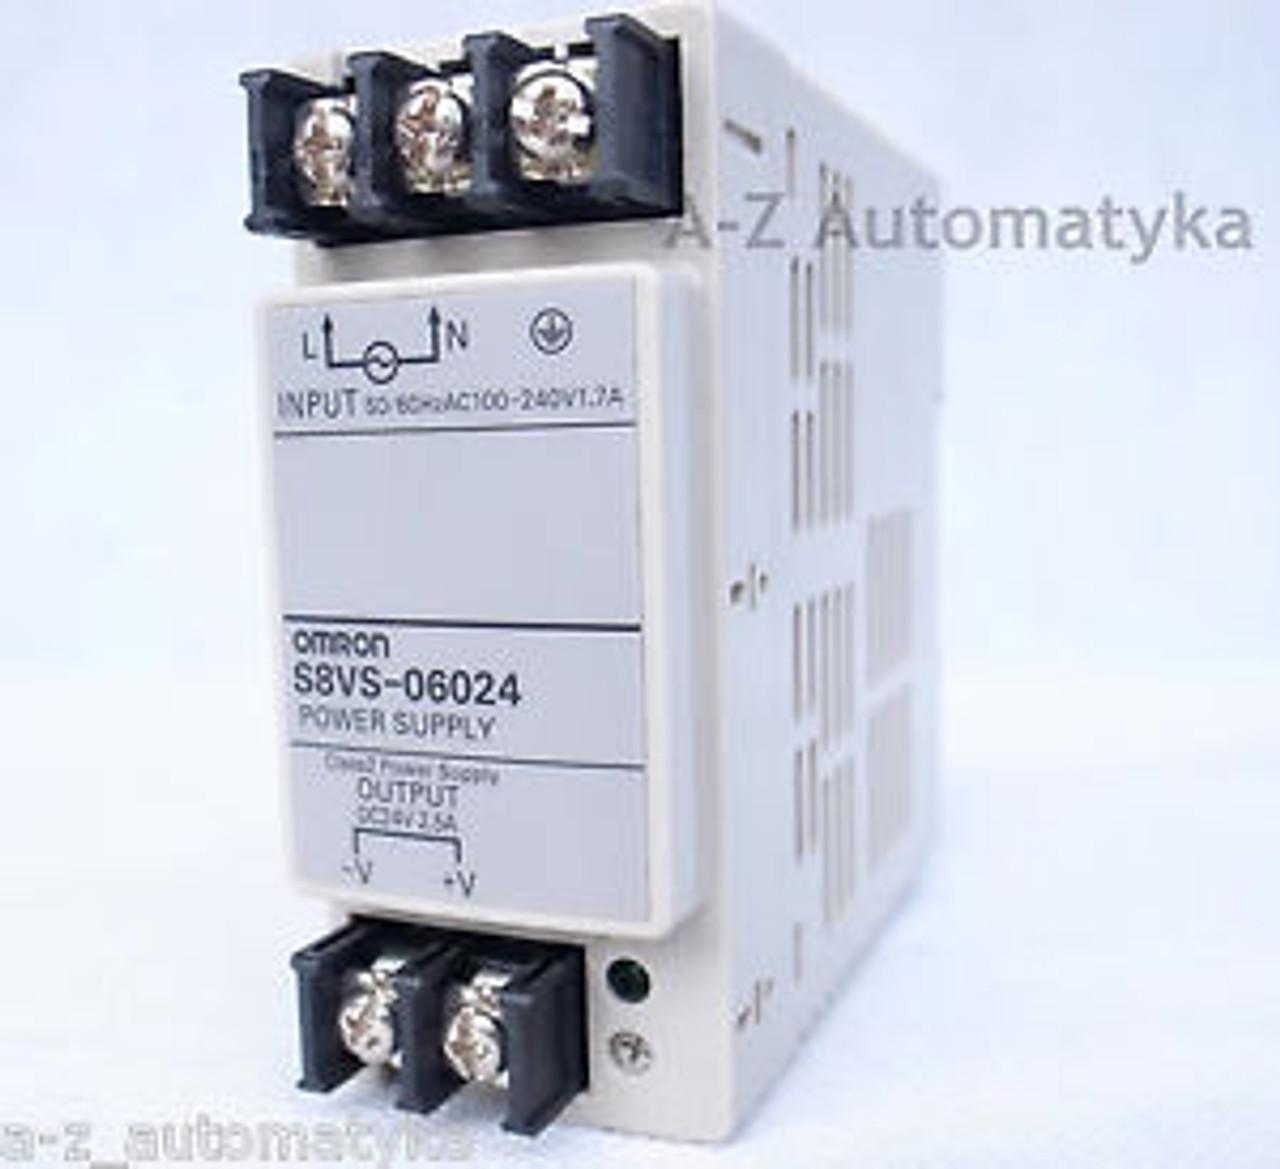 New Omron Power Supply S8VS-18024 100-240VAC In Box